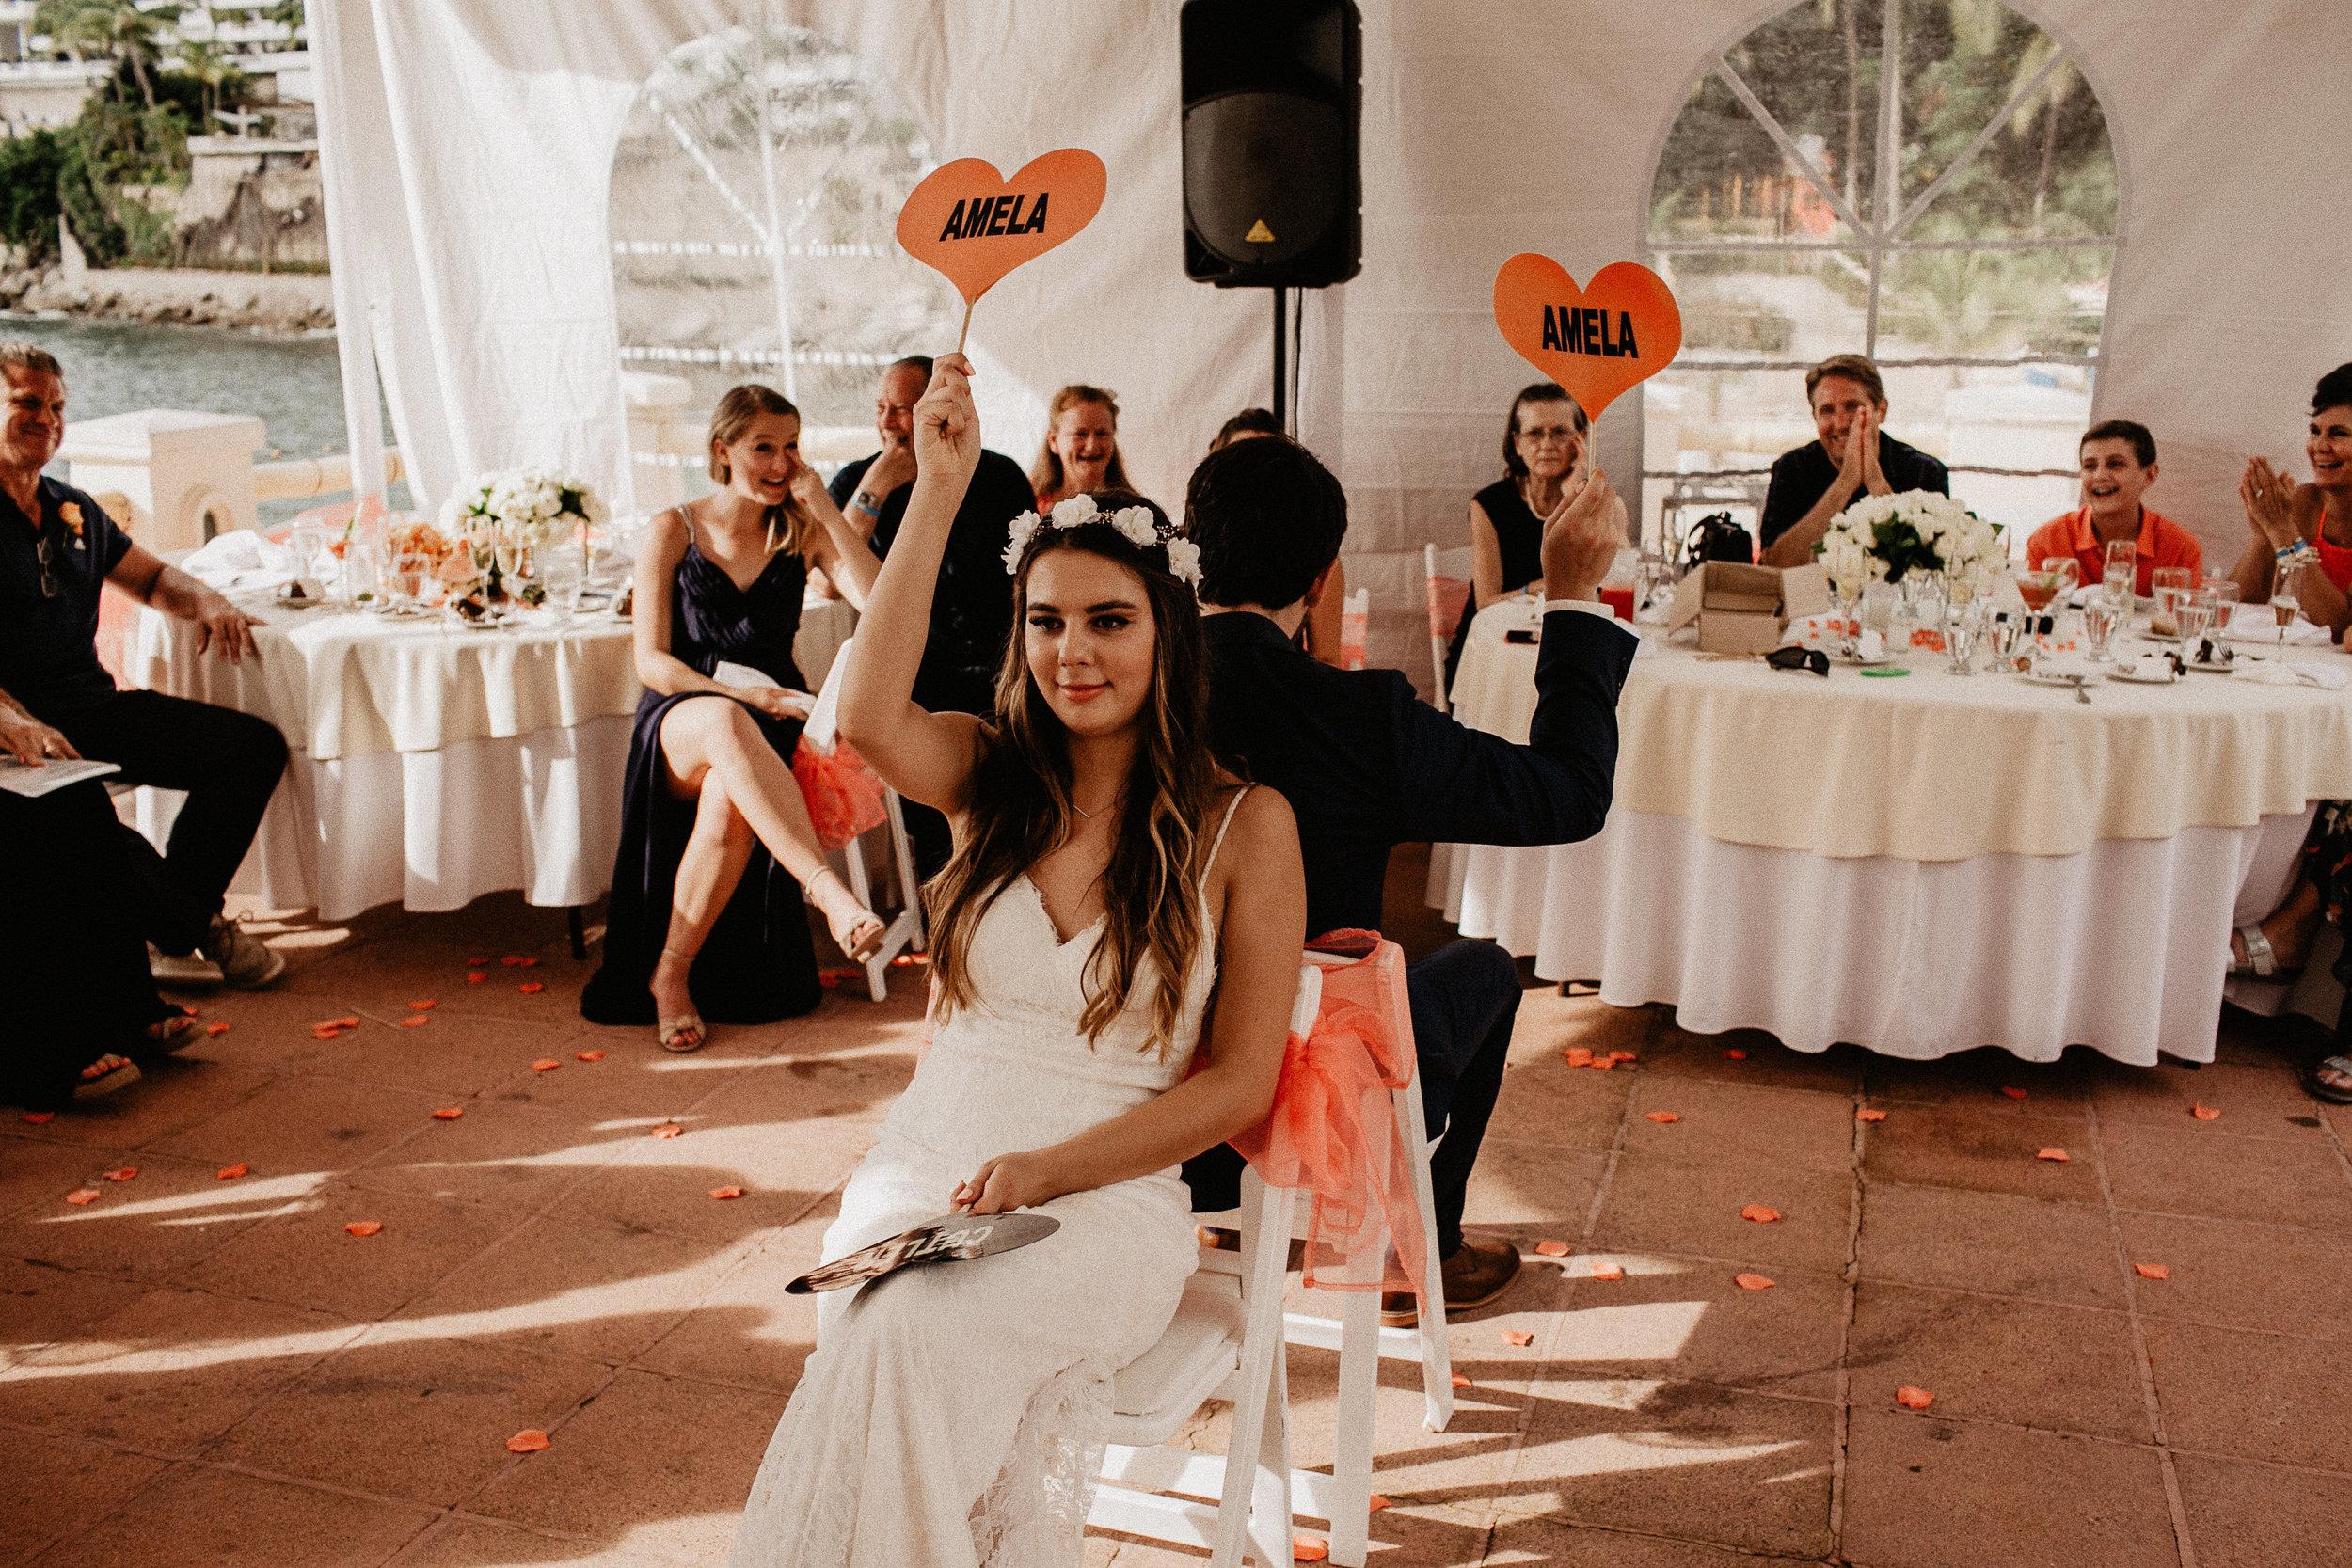 alfonso_flores_destination_wedding_photography_puerto_vallarta_hotel_barcelo_vallarta_cuttler_amela-649.JPG